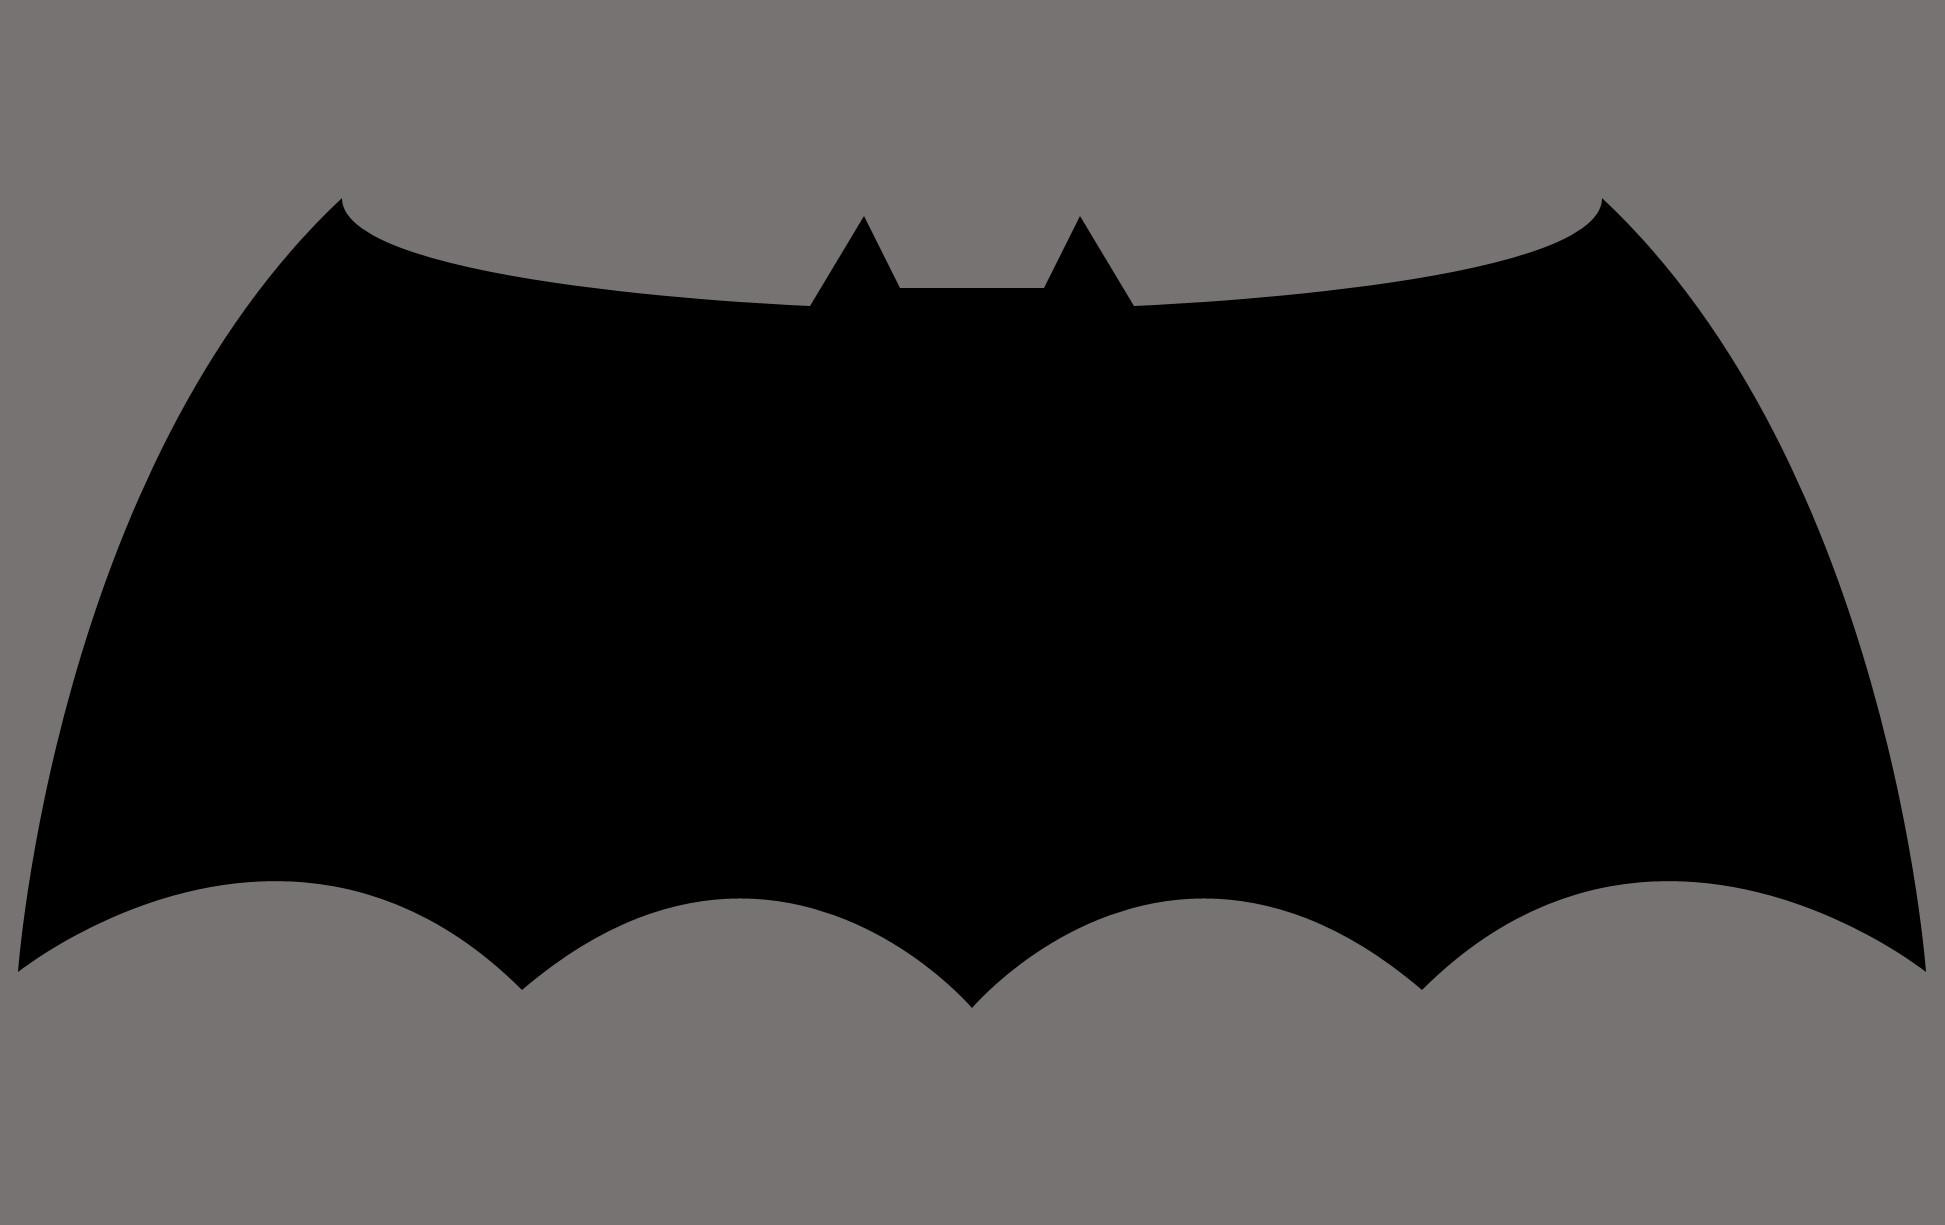 … Batman Dark Knight Returns Part 2 V2 by Angel-Of-DeathX1